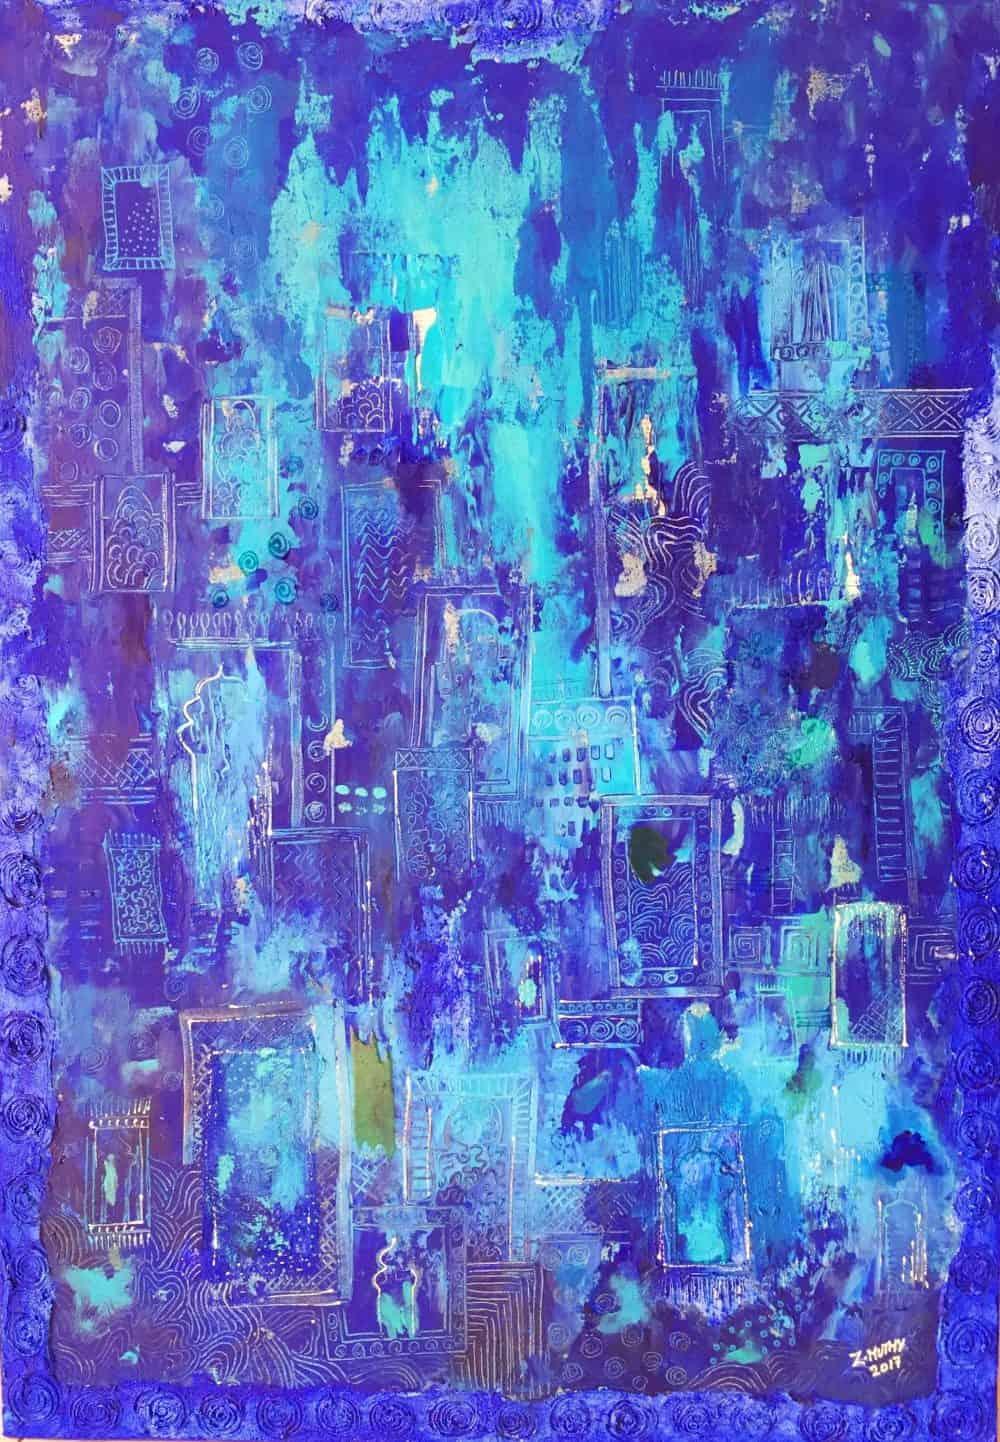 Mauritius Arts & Artists - mauritius-arts-zahiirah-mutty-magic-carpet